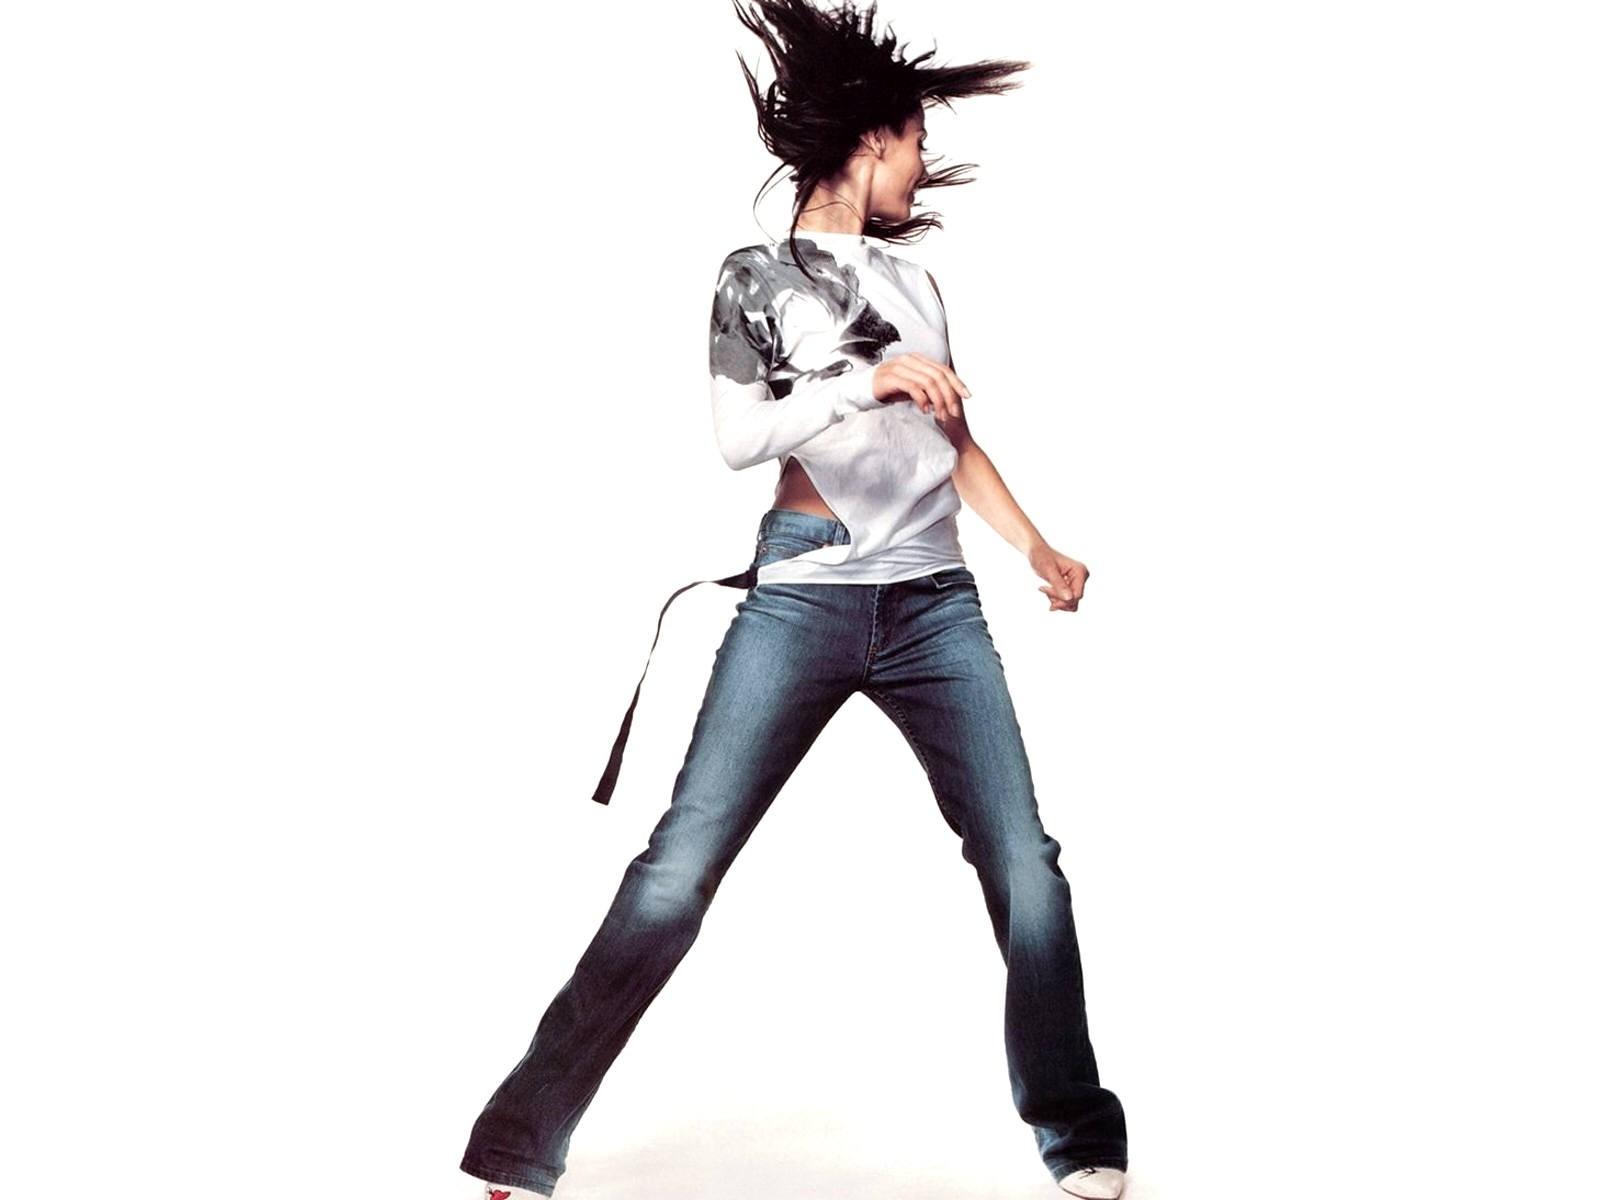 Wallpaper di Natalie Imbruglia, grintosa iin jeans